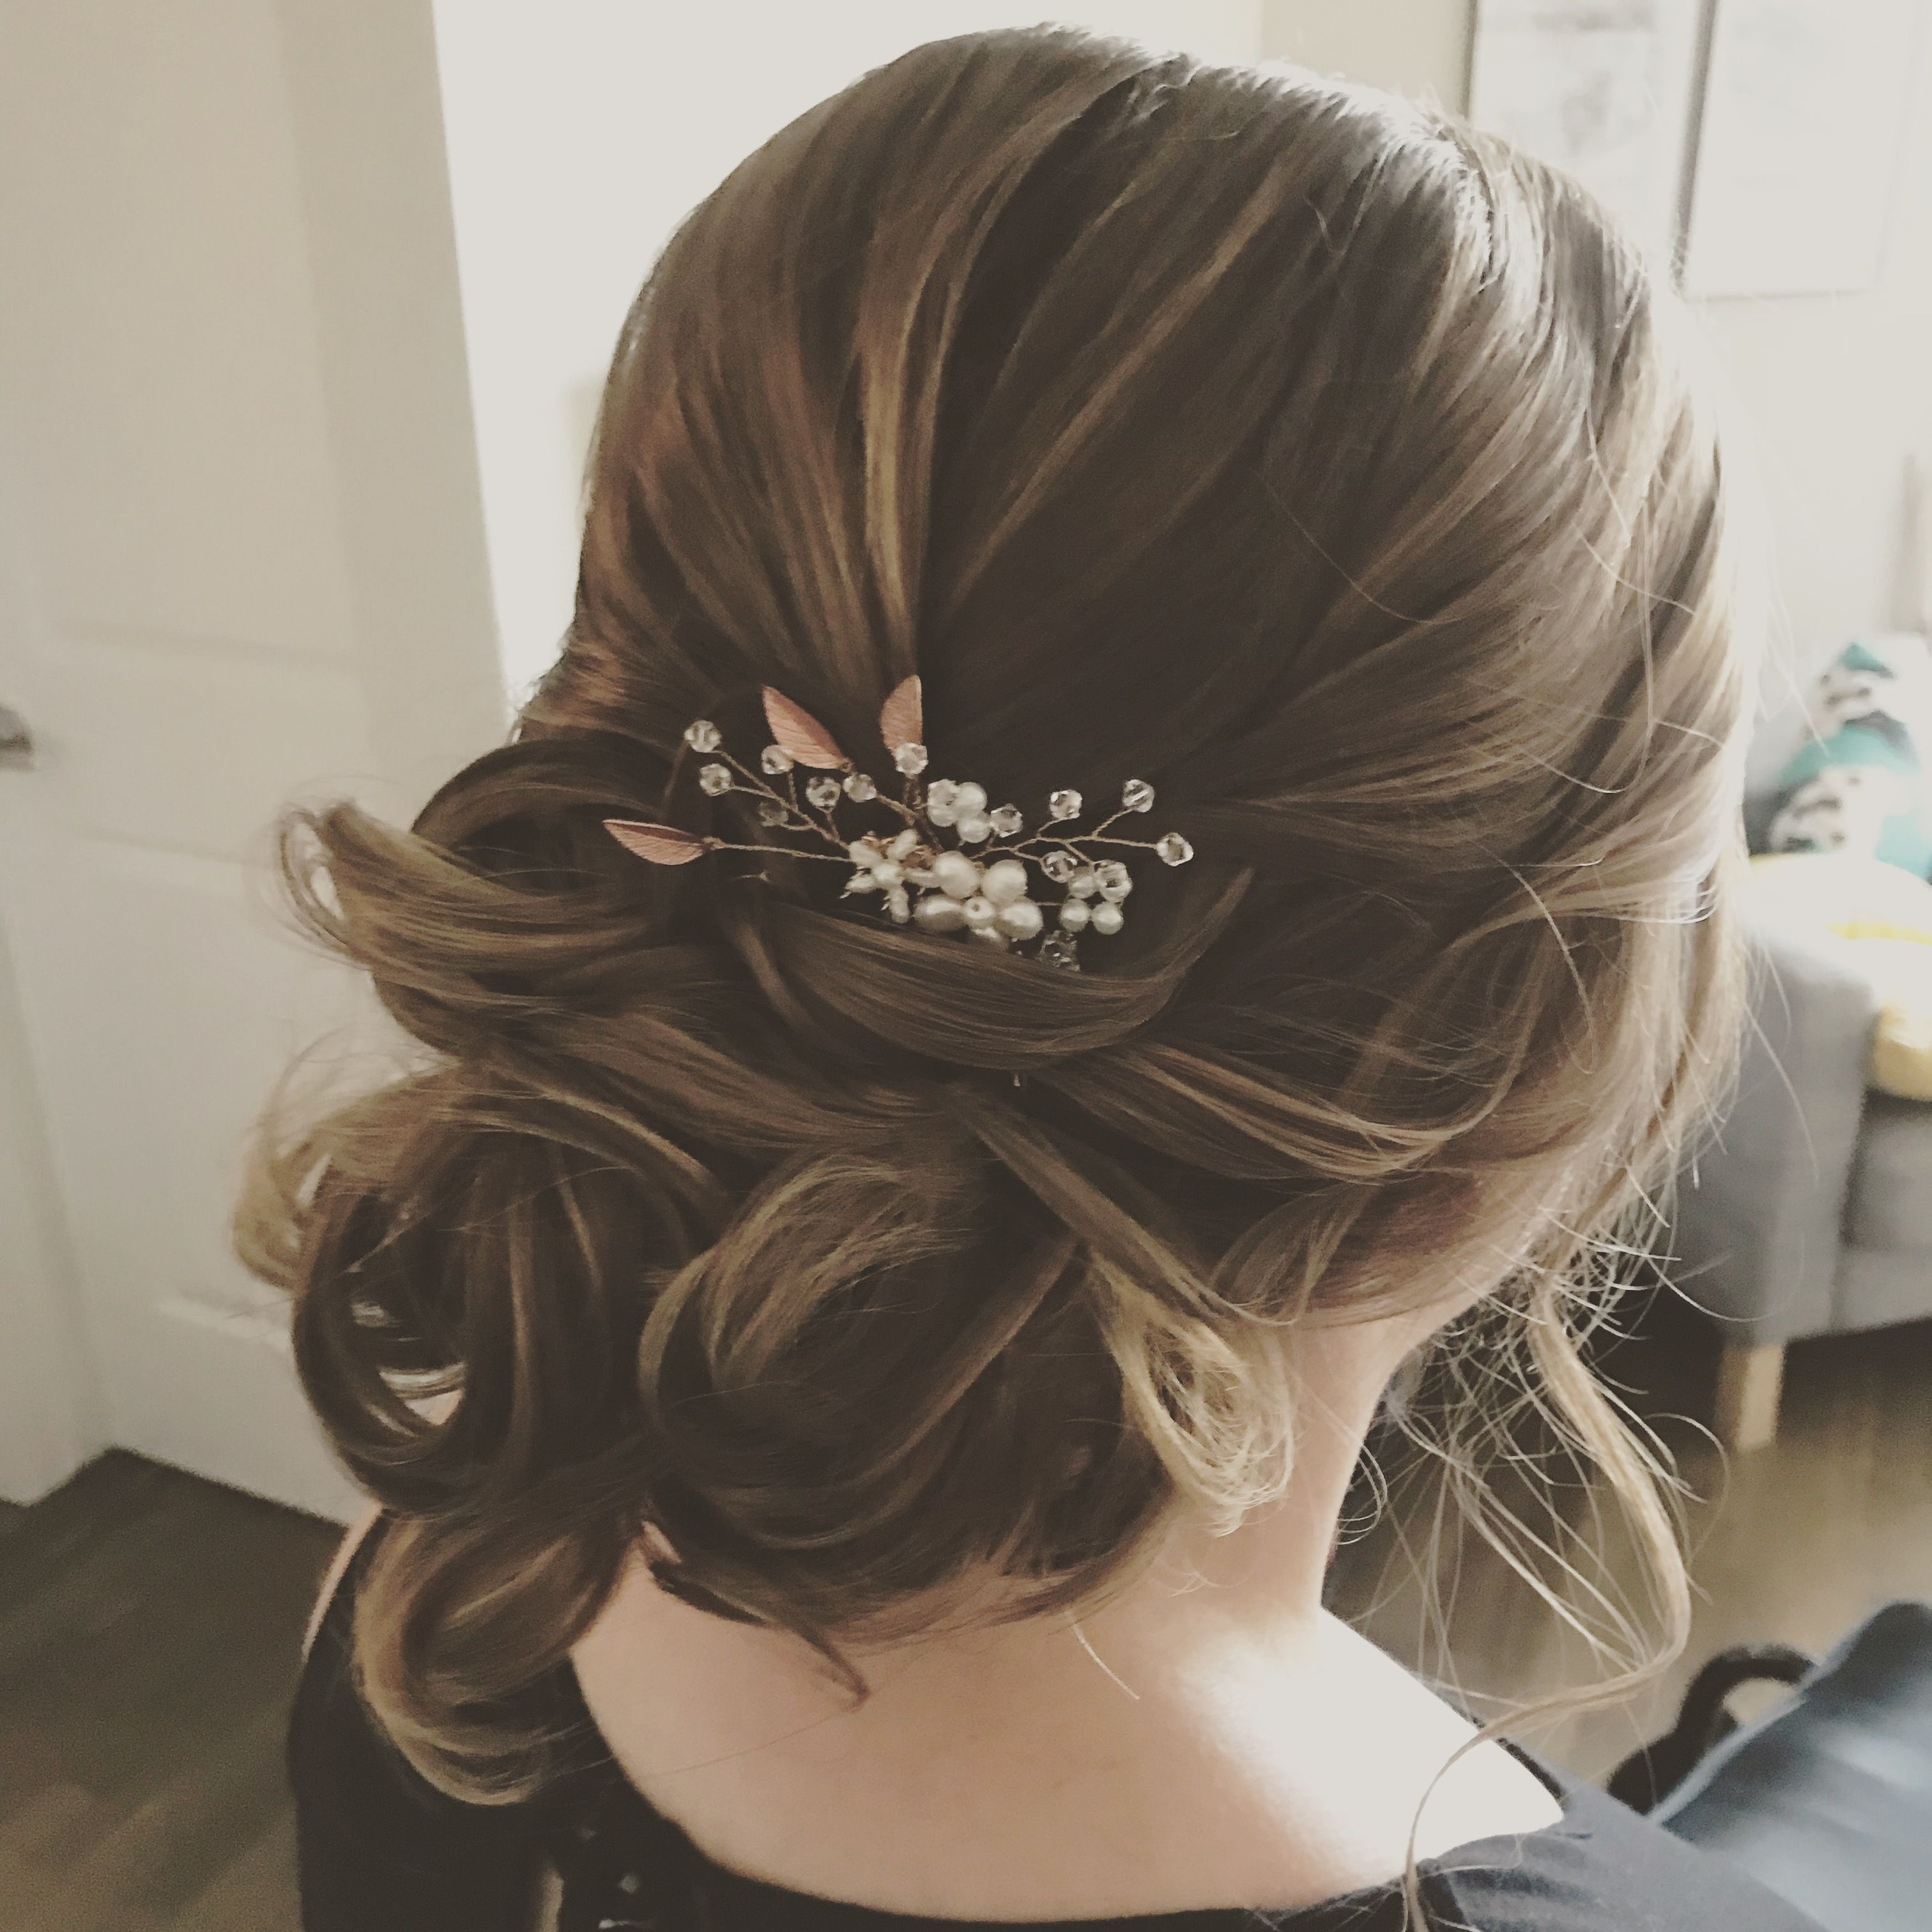 hair and makeup by beautiful calgary bride | wedding hair